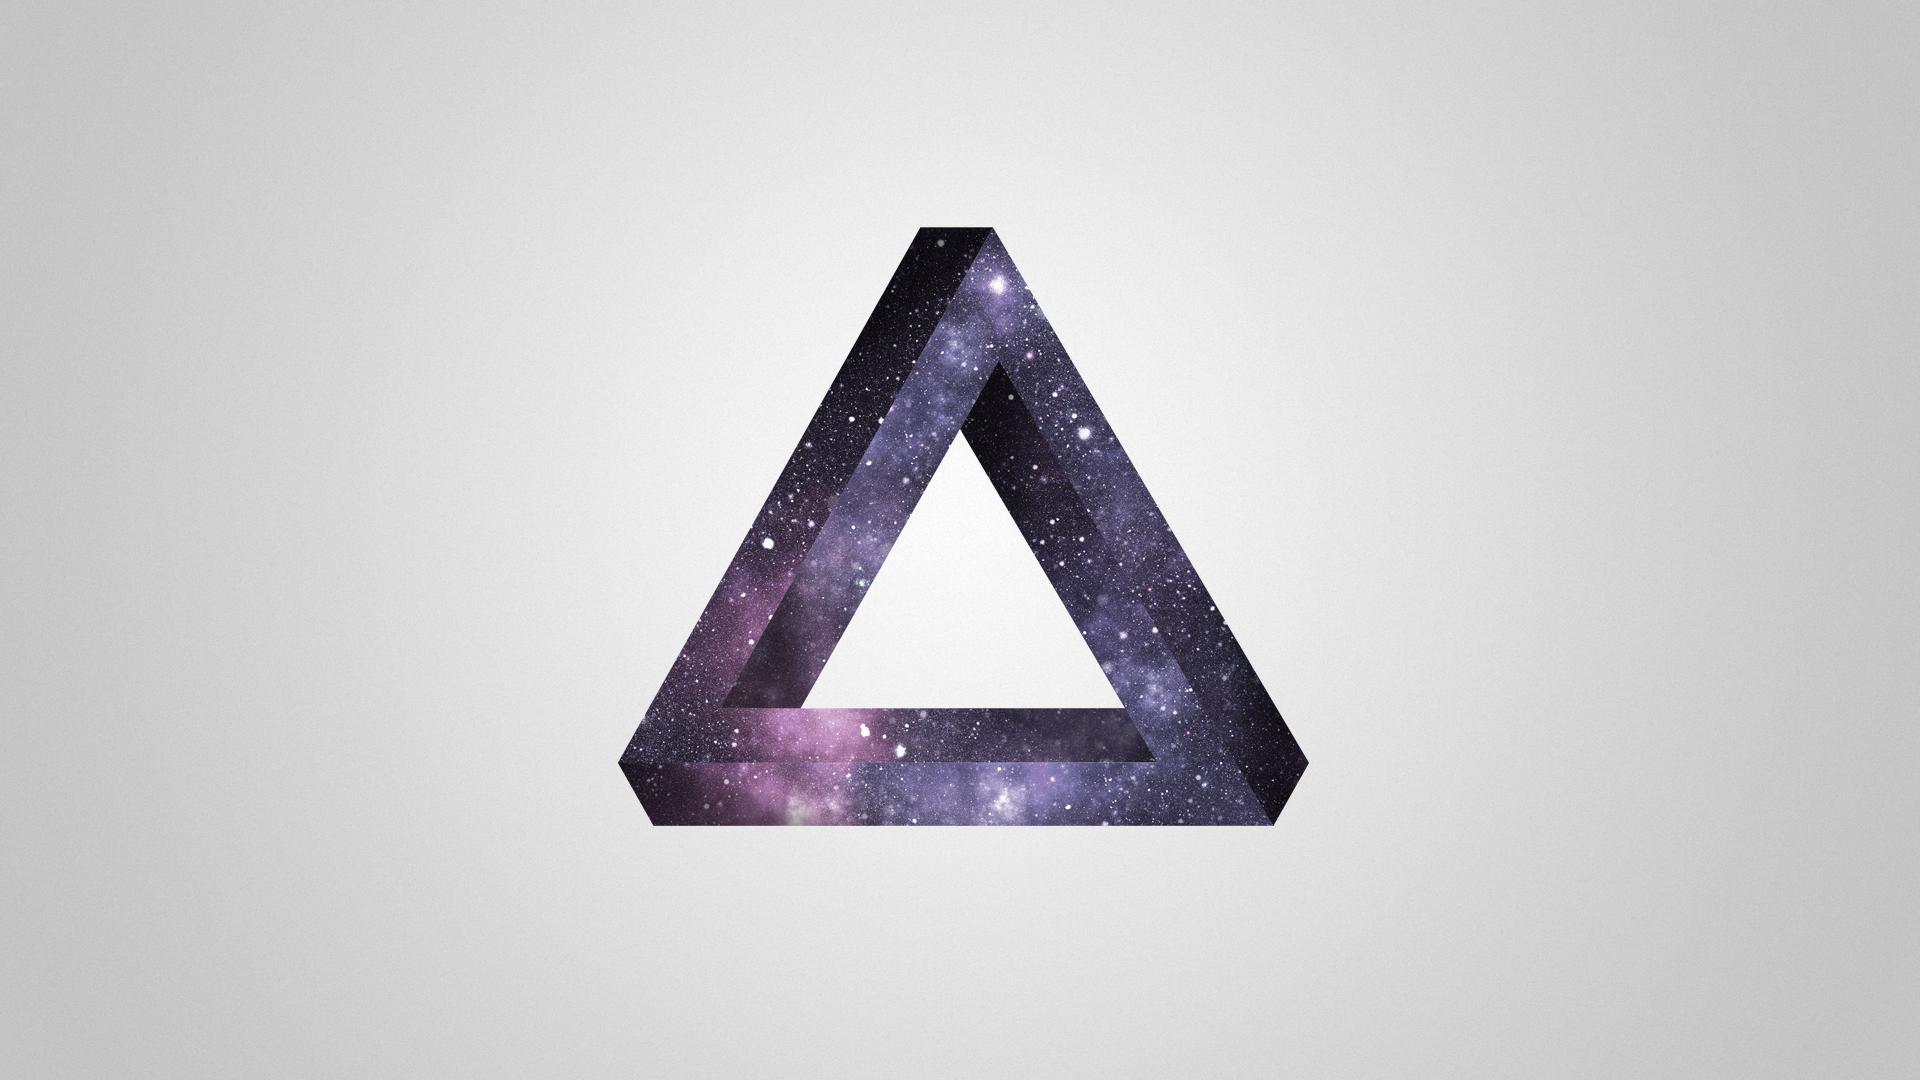 General 1920x1080 Penrose triangle minimalism optical illusion triangle stars simple background digital art space art